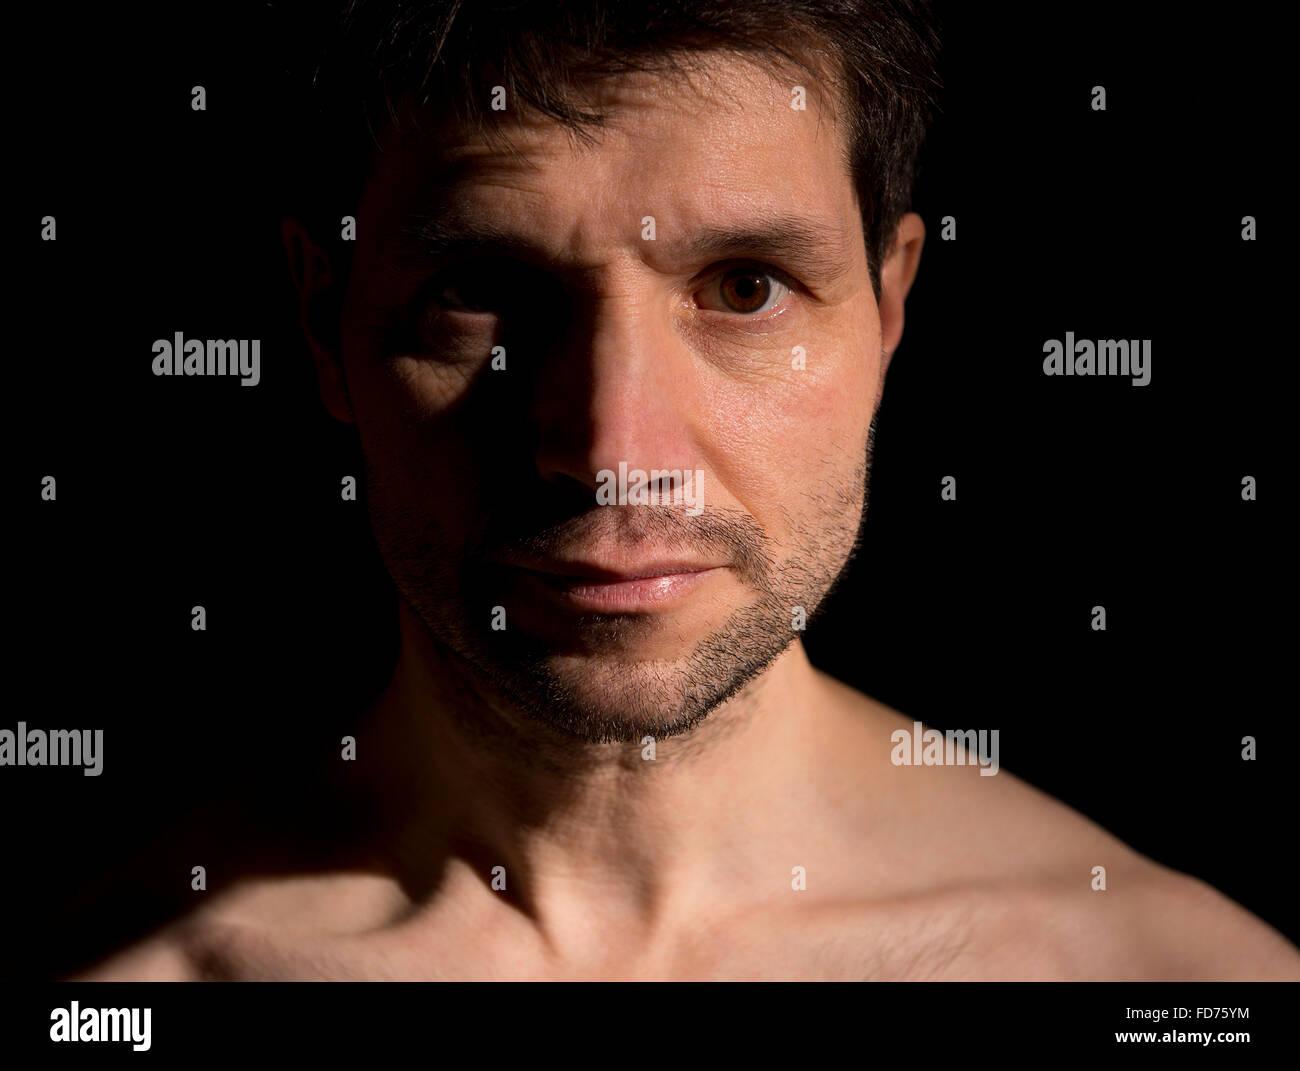 Half Face In Shadow Stock Photos Amp Half Face In Shadow